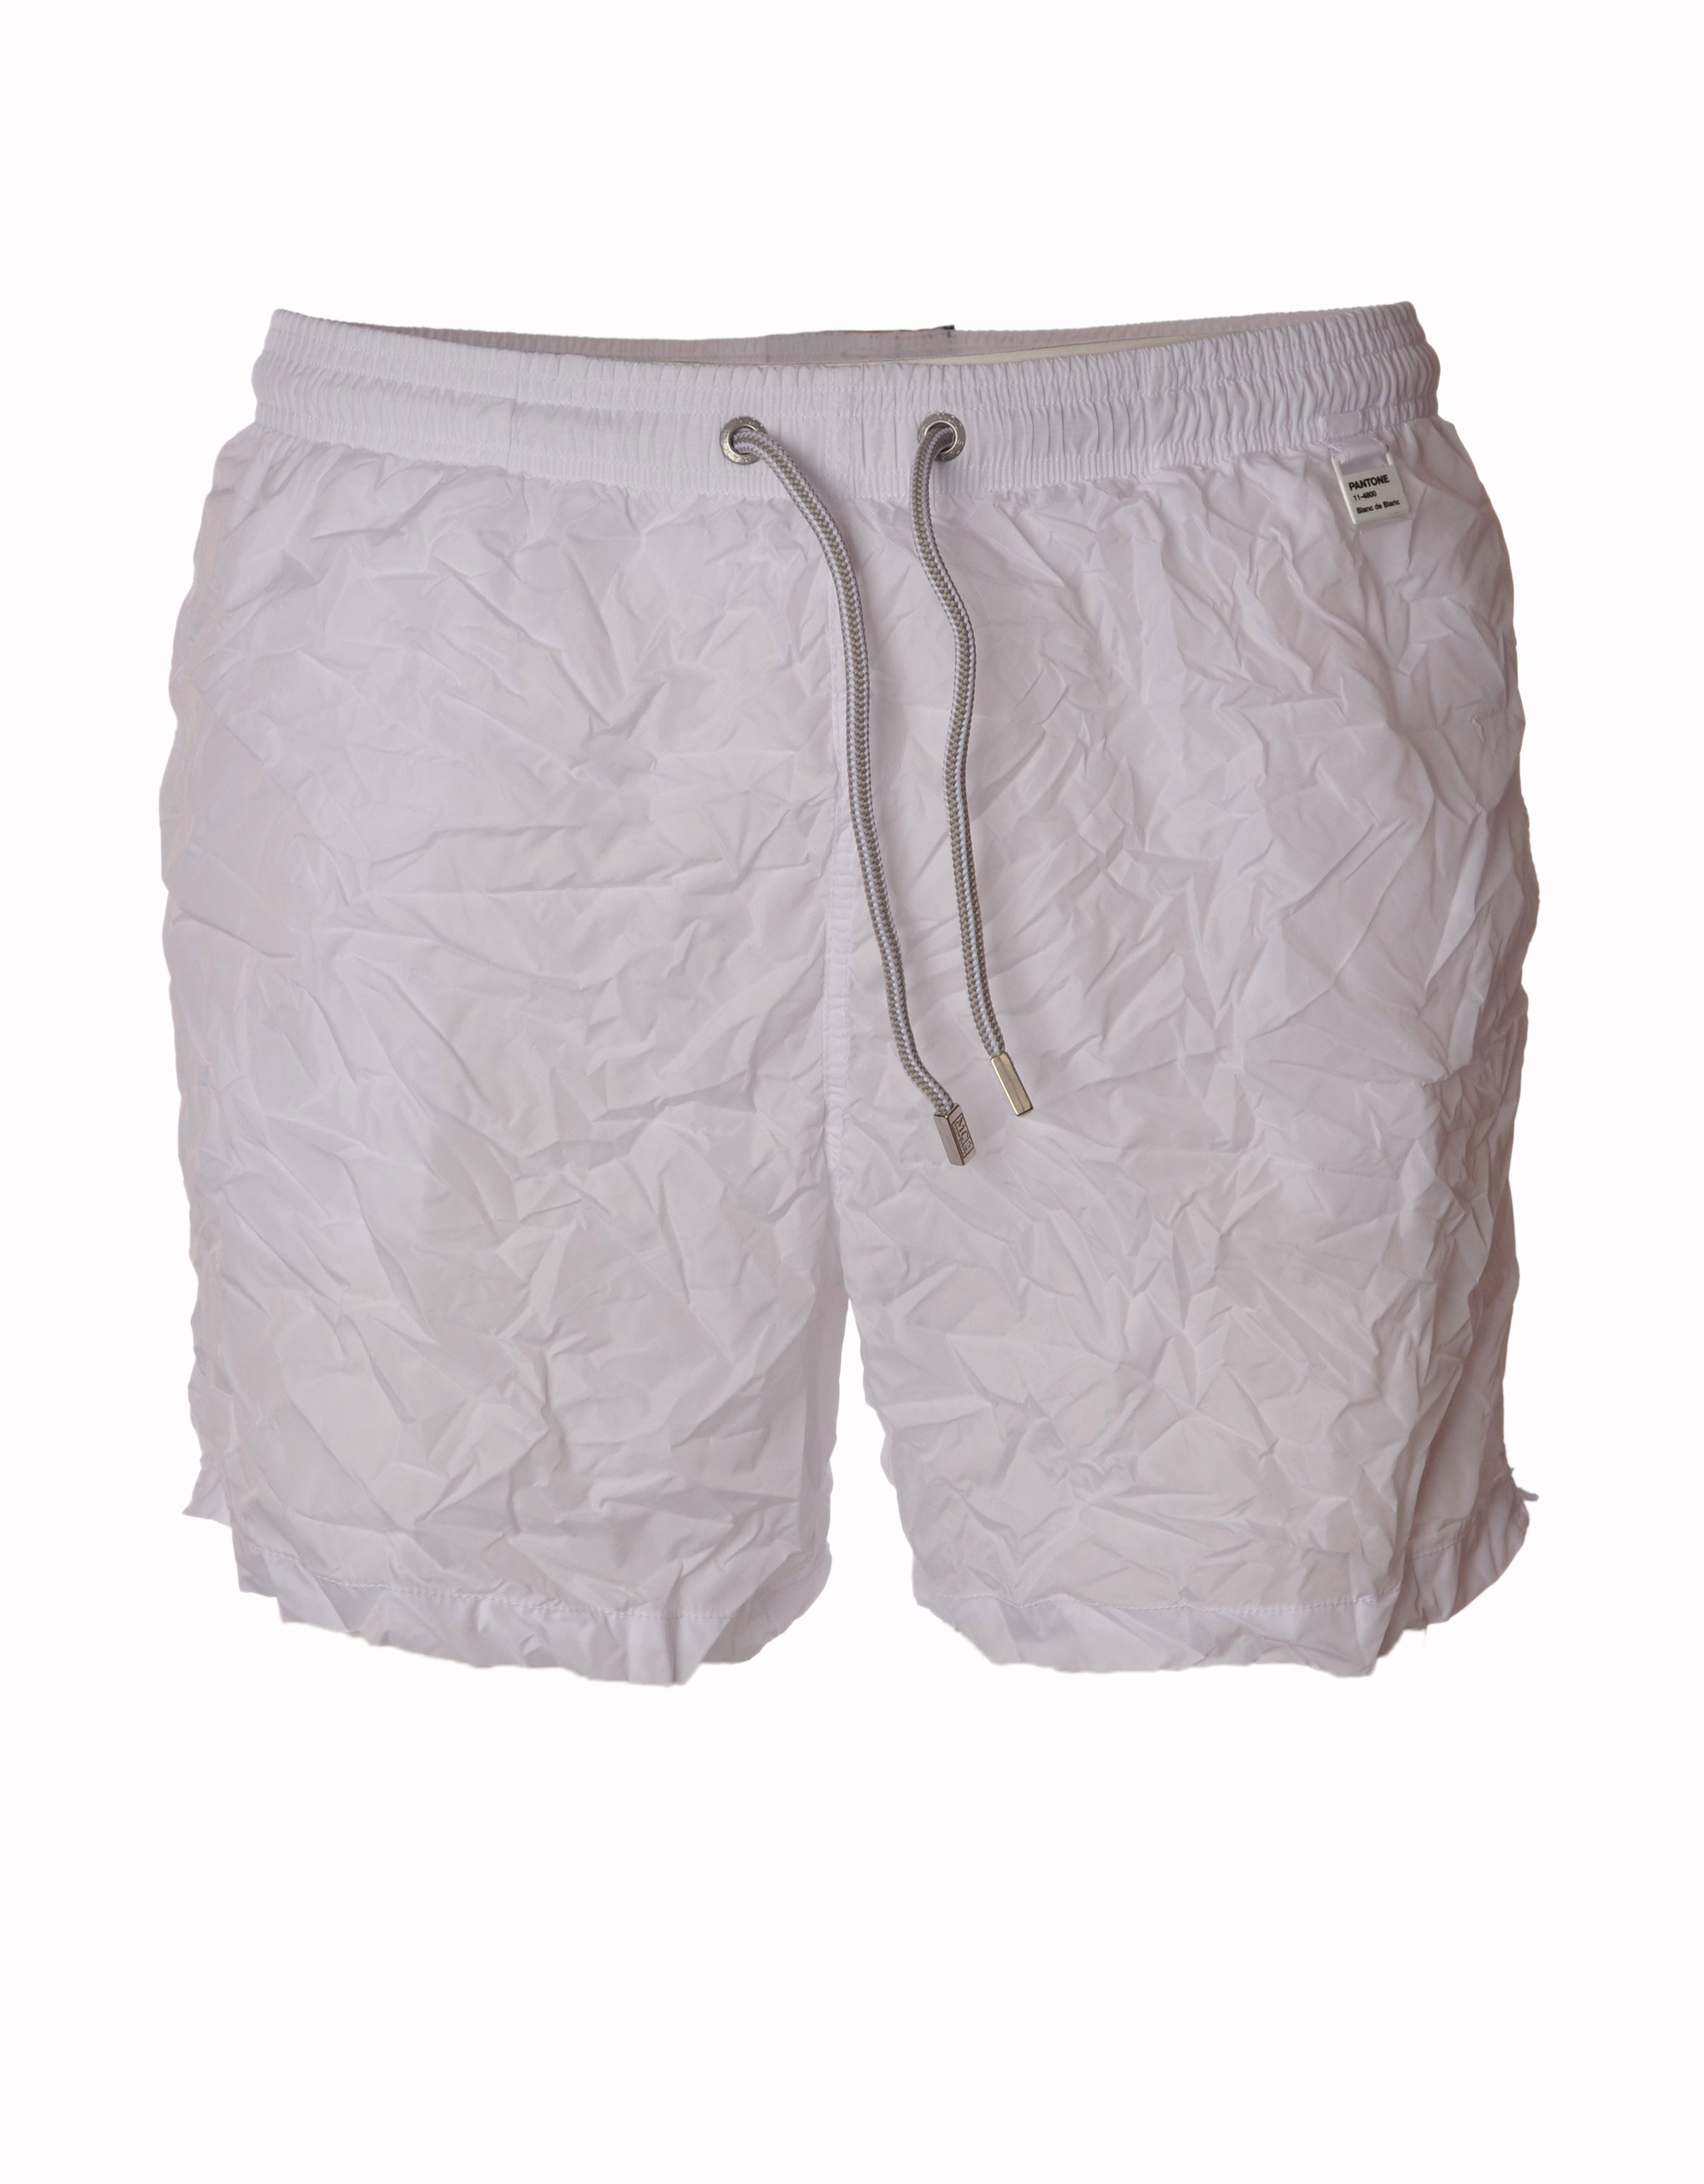 Saint barth supreme pantone costumi da bagno shorts bemymood - Supreme costume da bagno ...